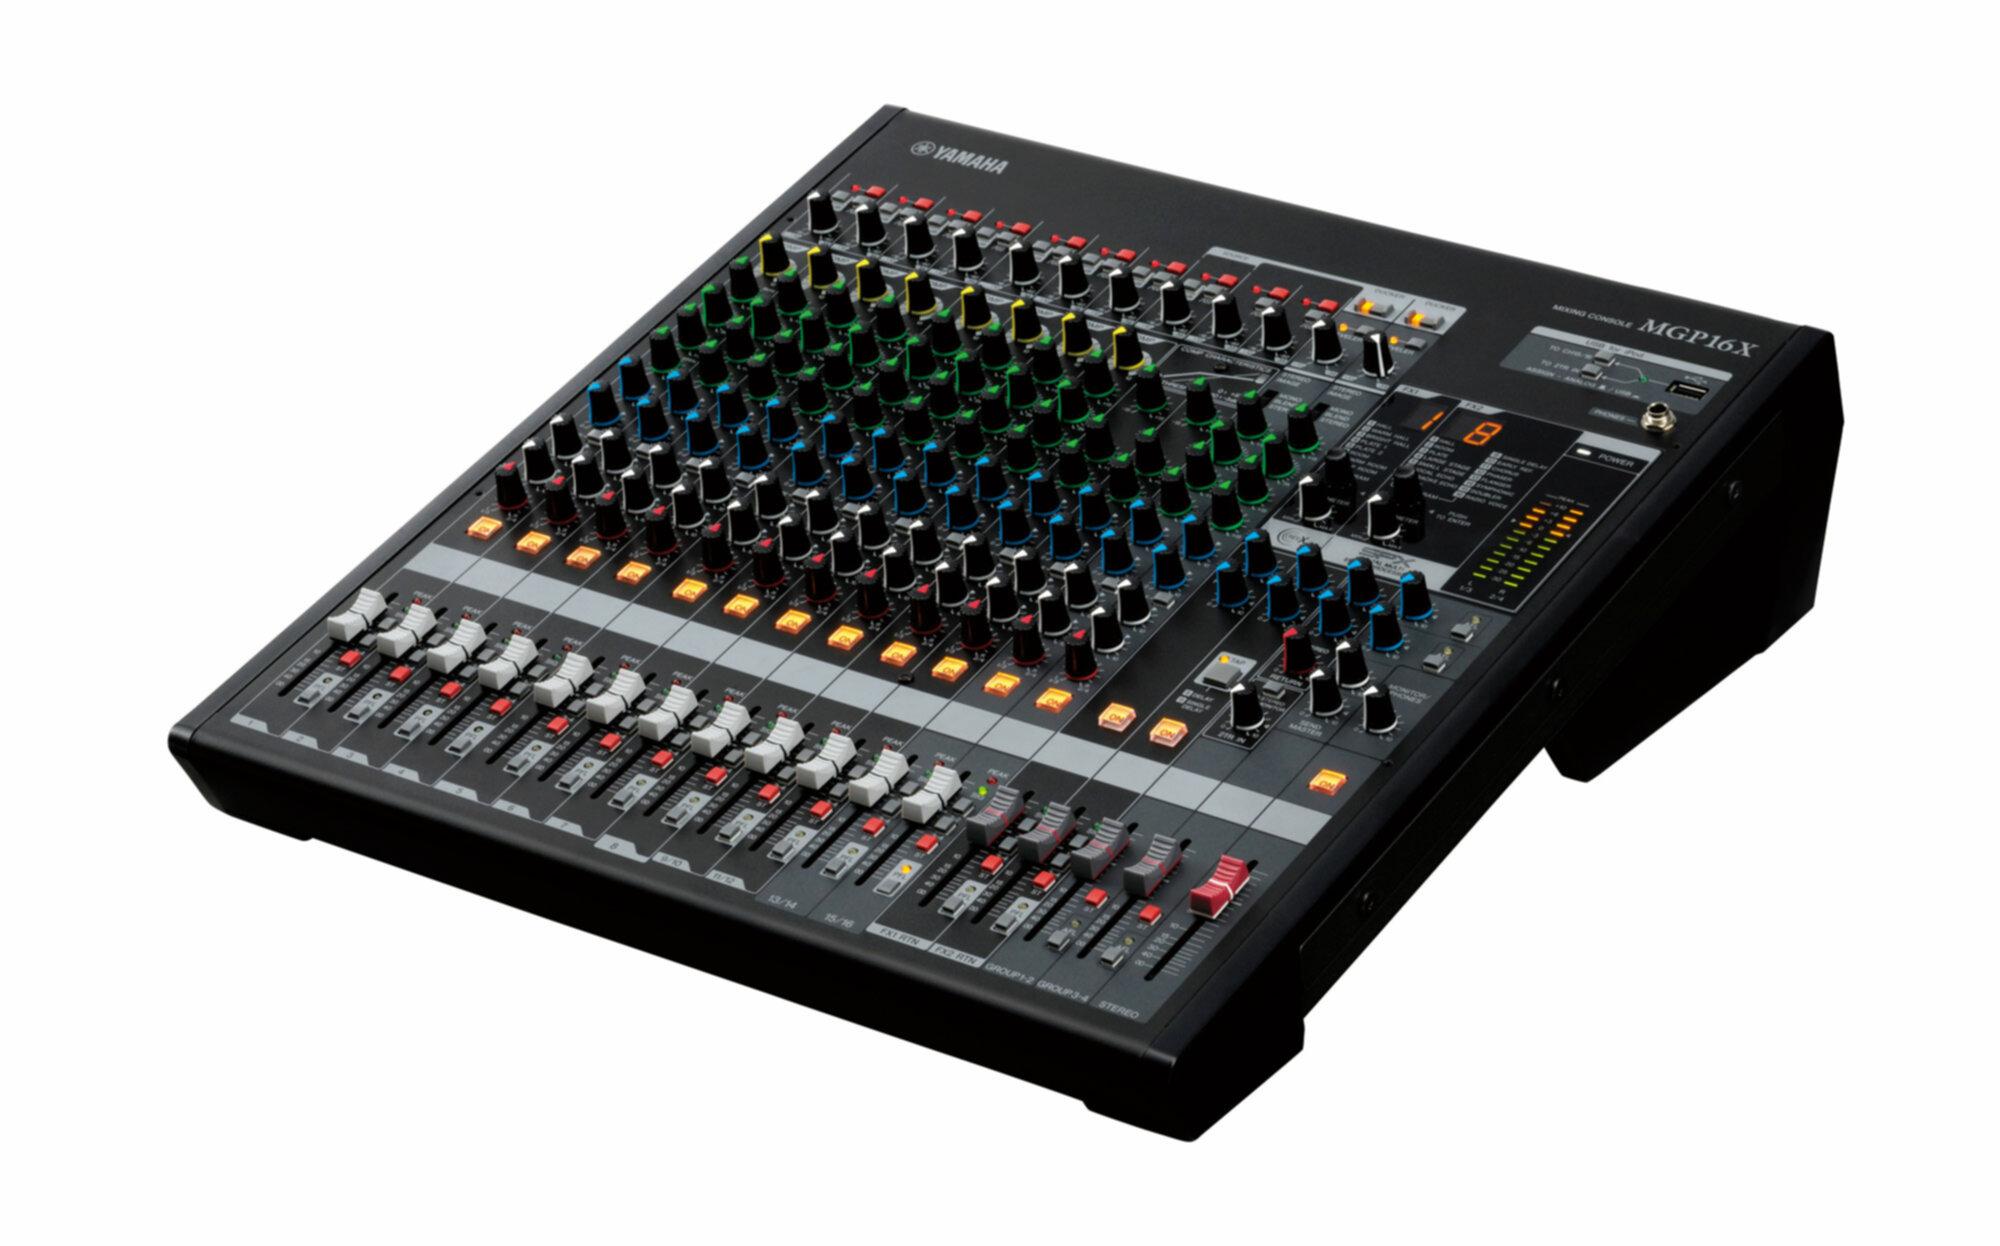 Yamaha mgp16x 749 00 tables de mixage analogique guitare piano batterie basse for Table yamaha